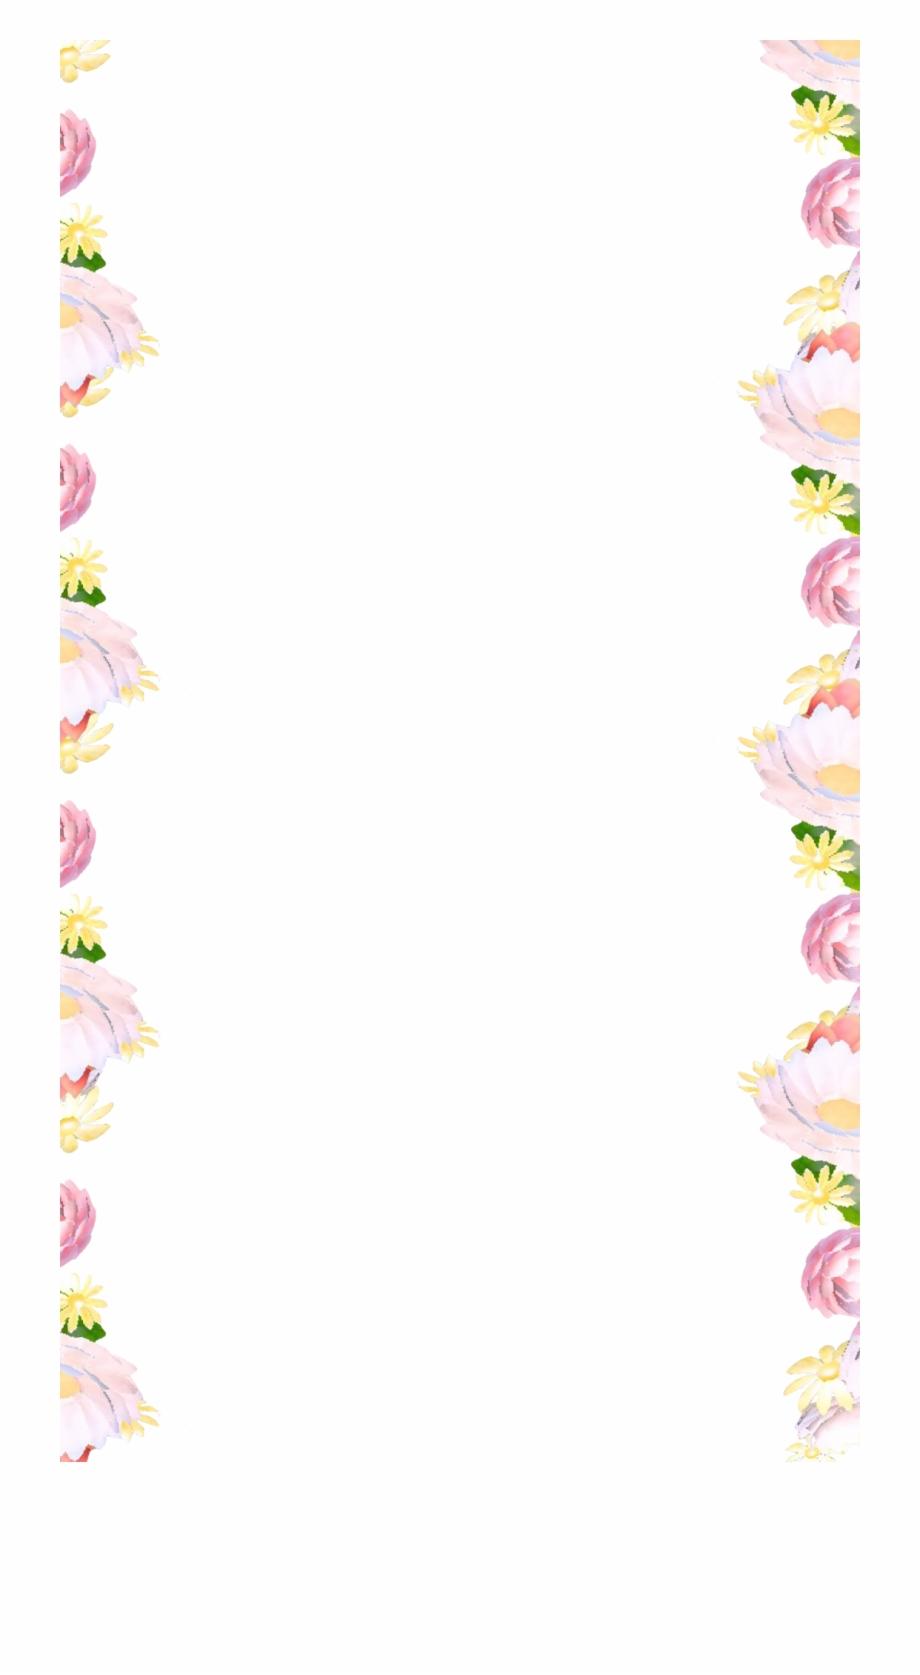 Snapchat border clipart png transparent Flower Border - Flower Border Snapchat Filter Free PNG ... png transparent